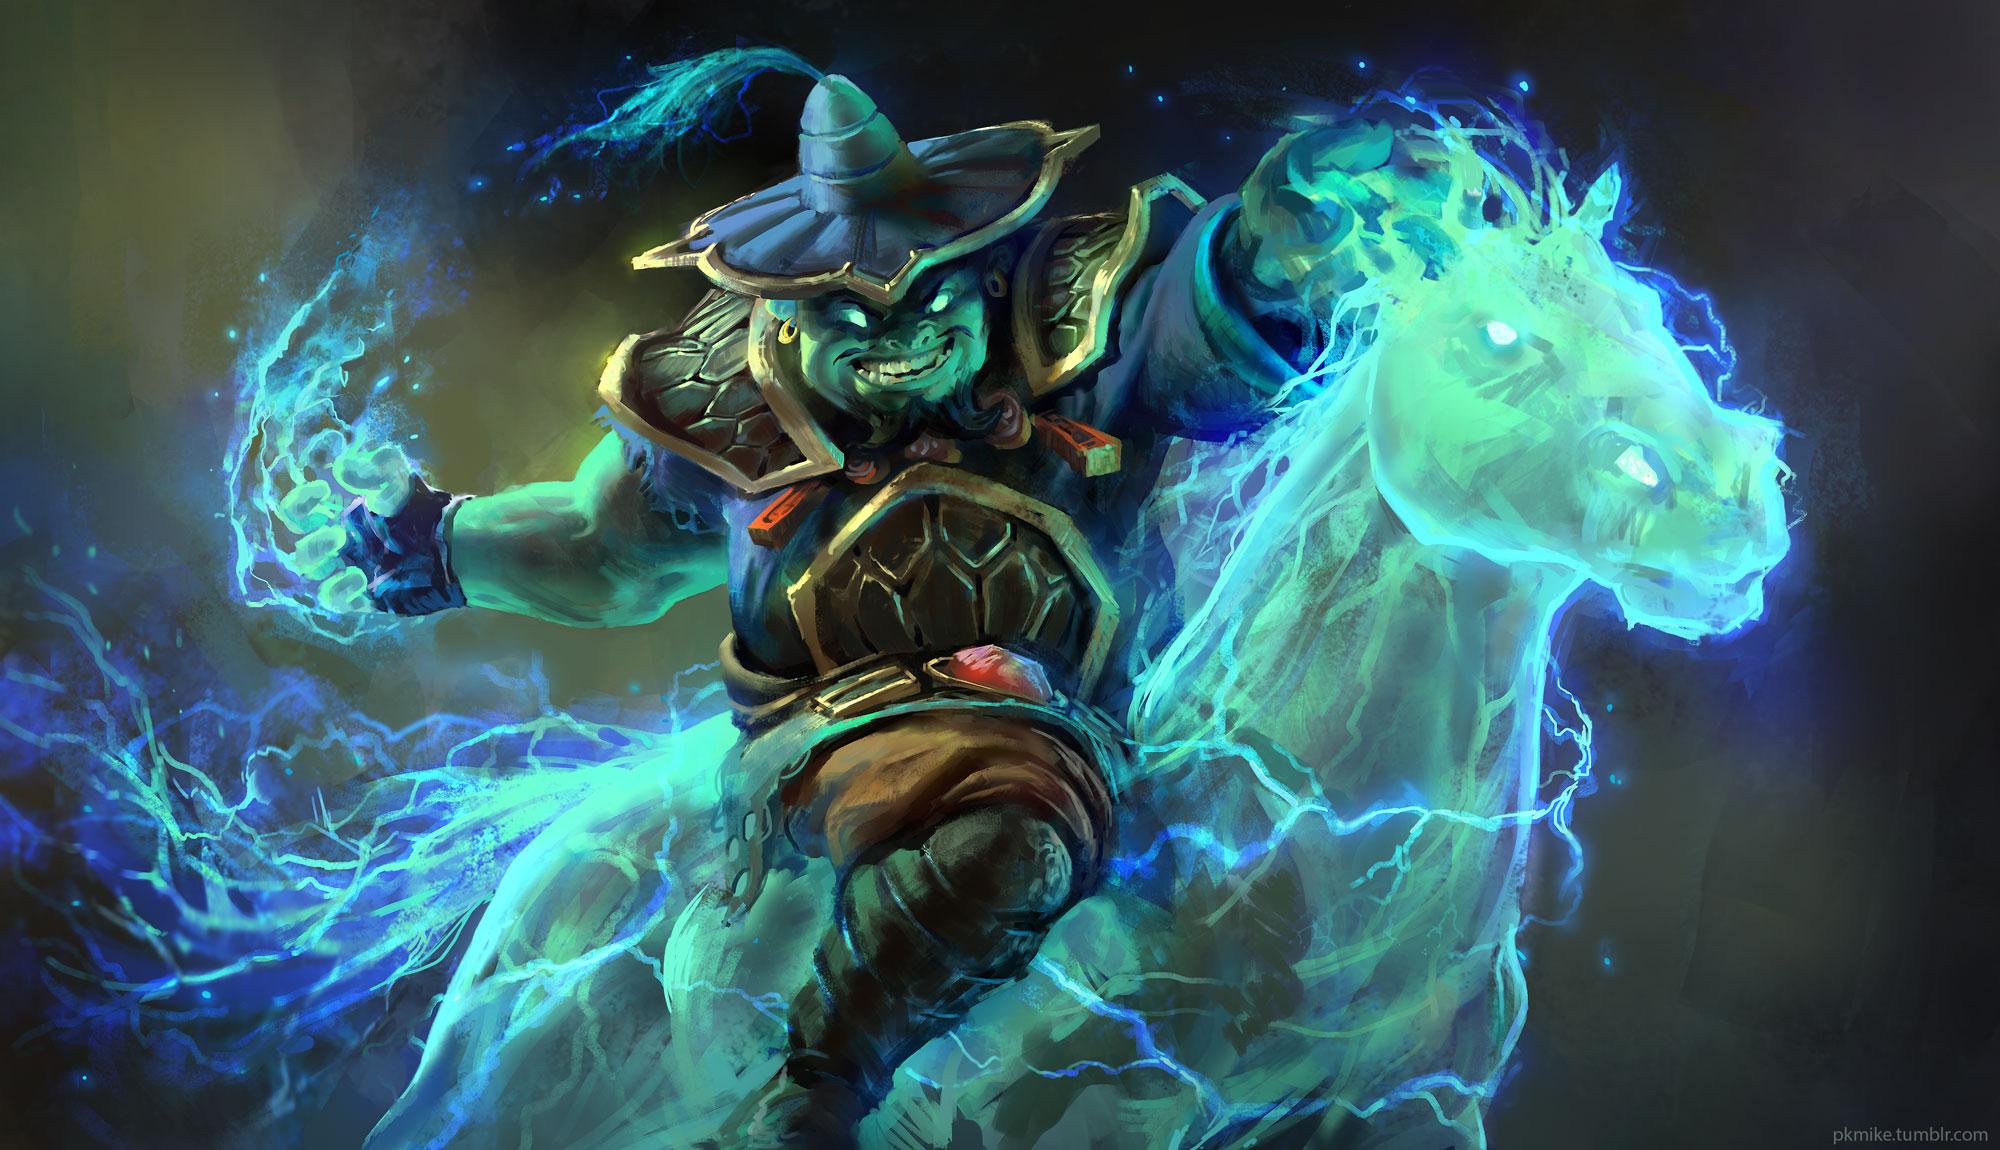 Raijin Thunderkeg the Storm Spirit   Dota 2 wallpaper 2000x1150